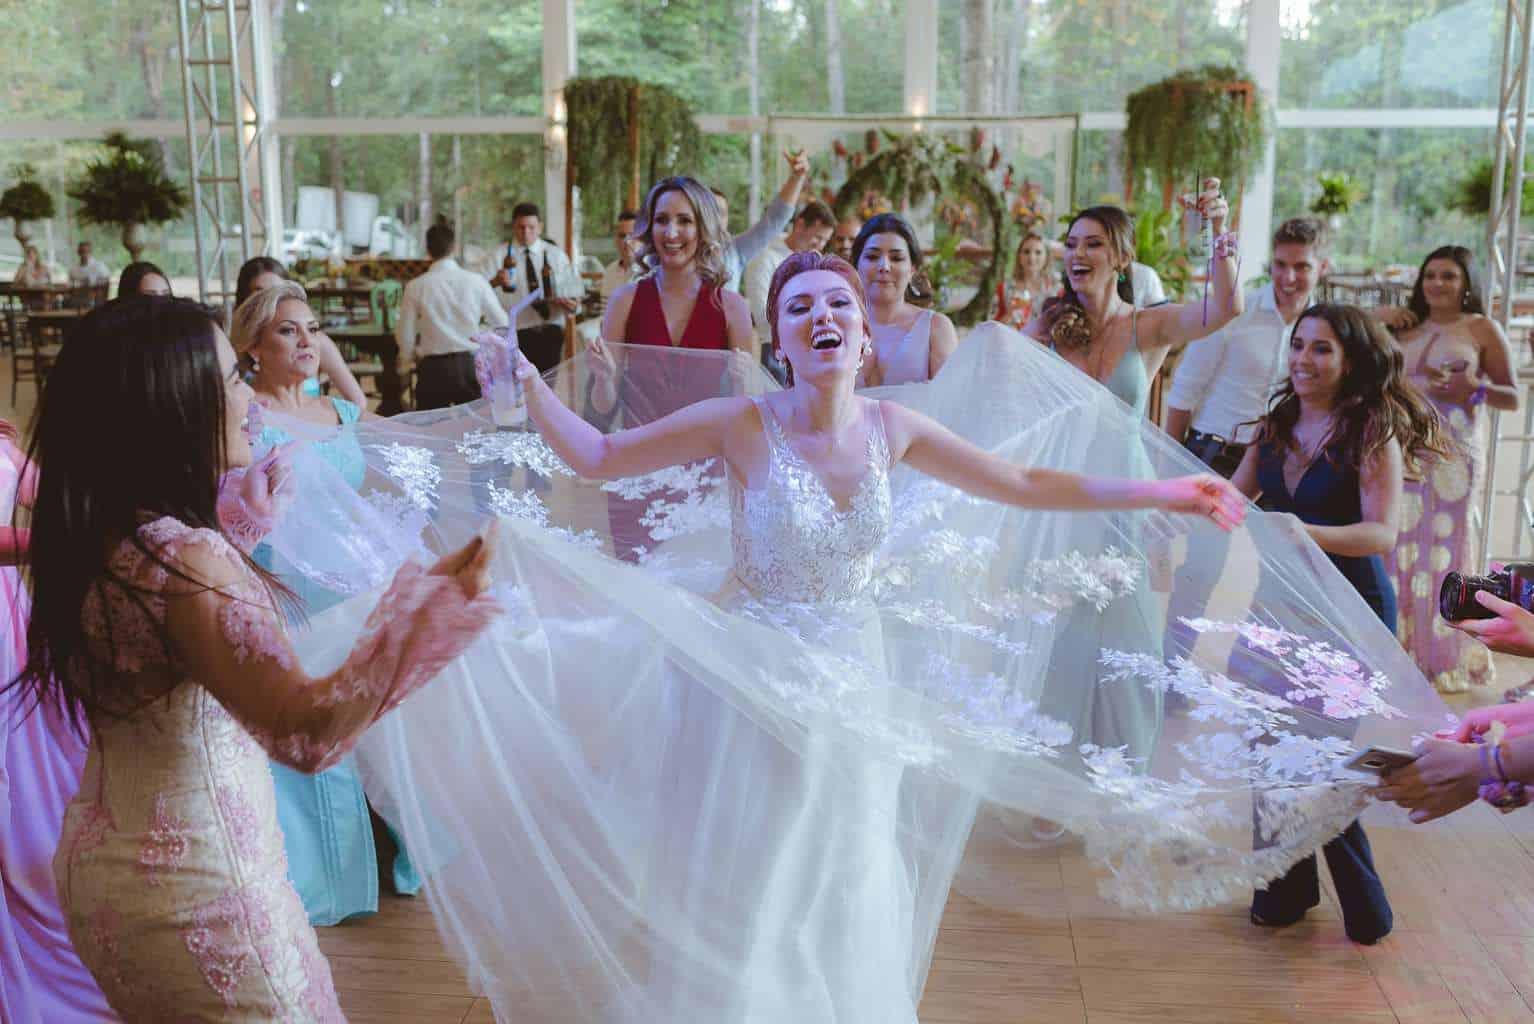 casamento-ao-ar-livre-casamento-boho-casamento-geek-casamento-rustico-casamento-Thais-e-Pedro-festa-Revoar-Fotografia-Villa-Borghese-Eventos-85